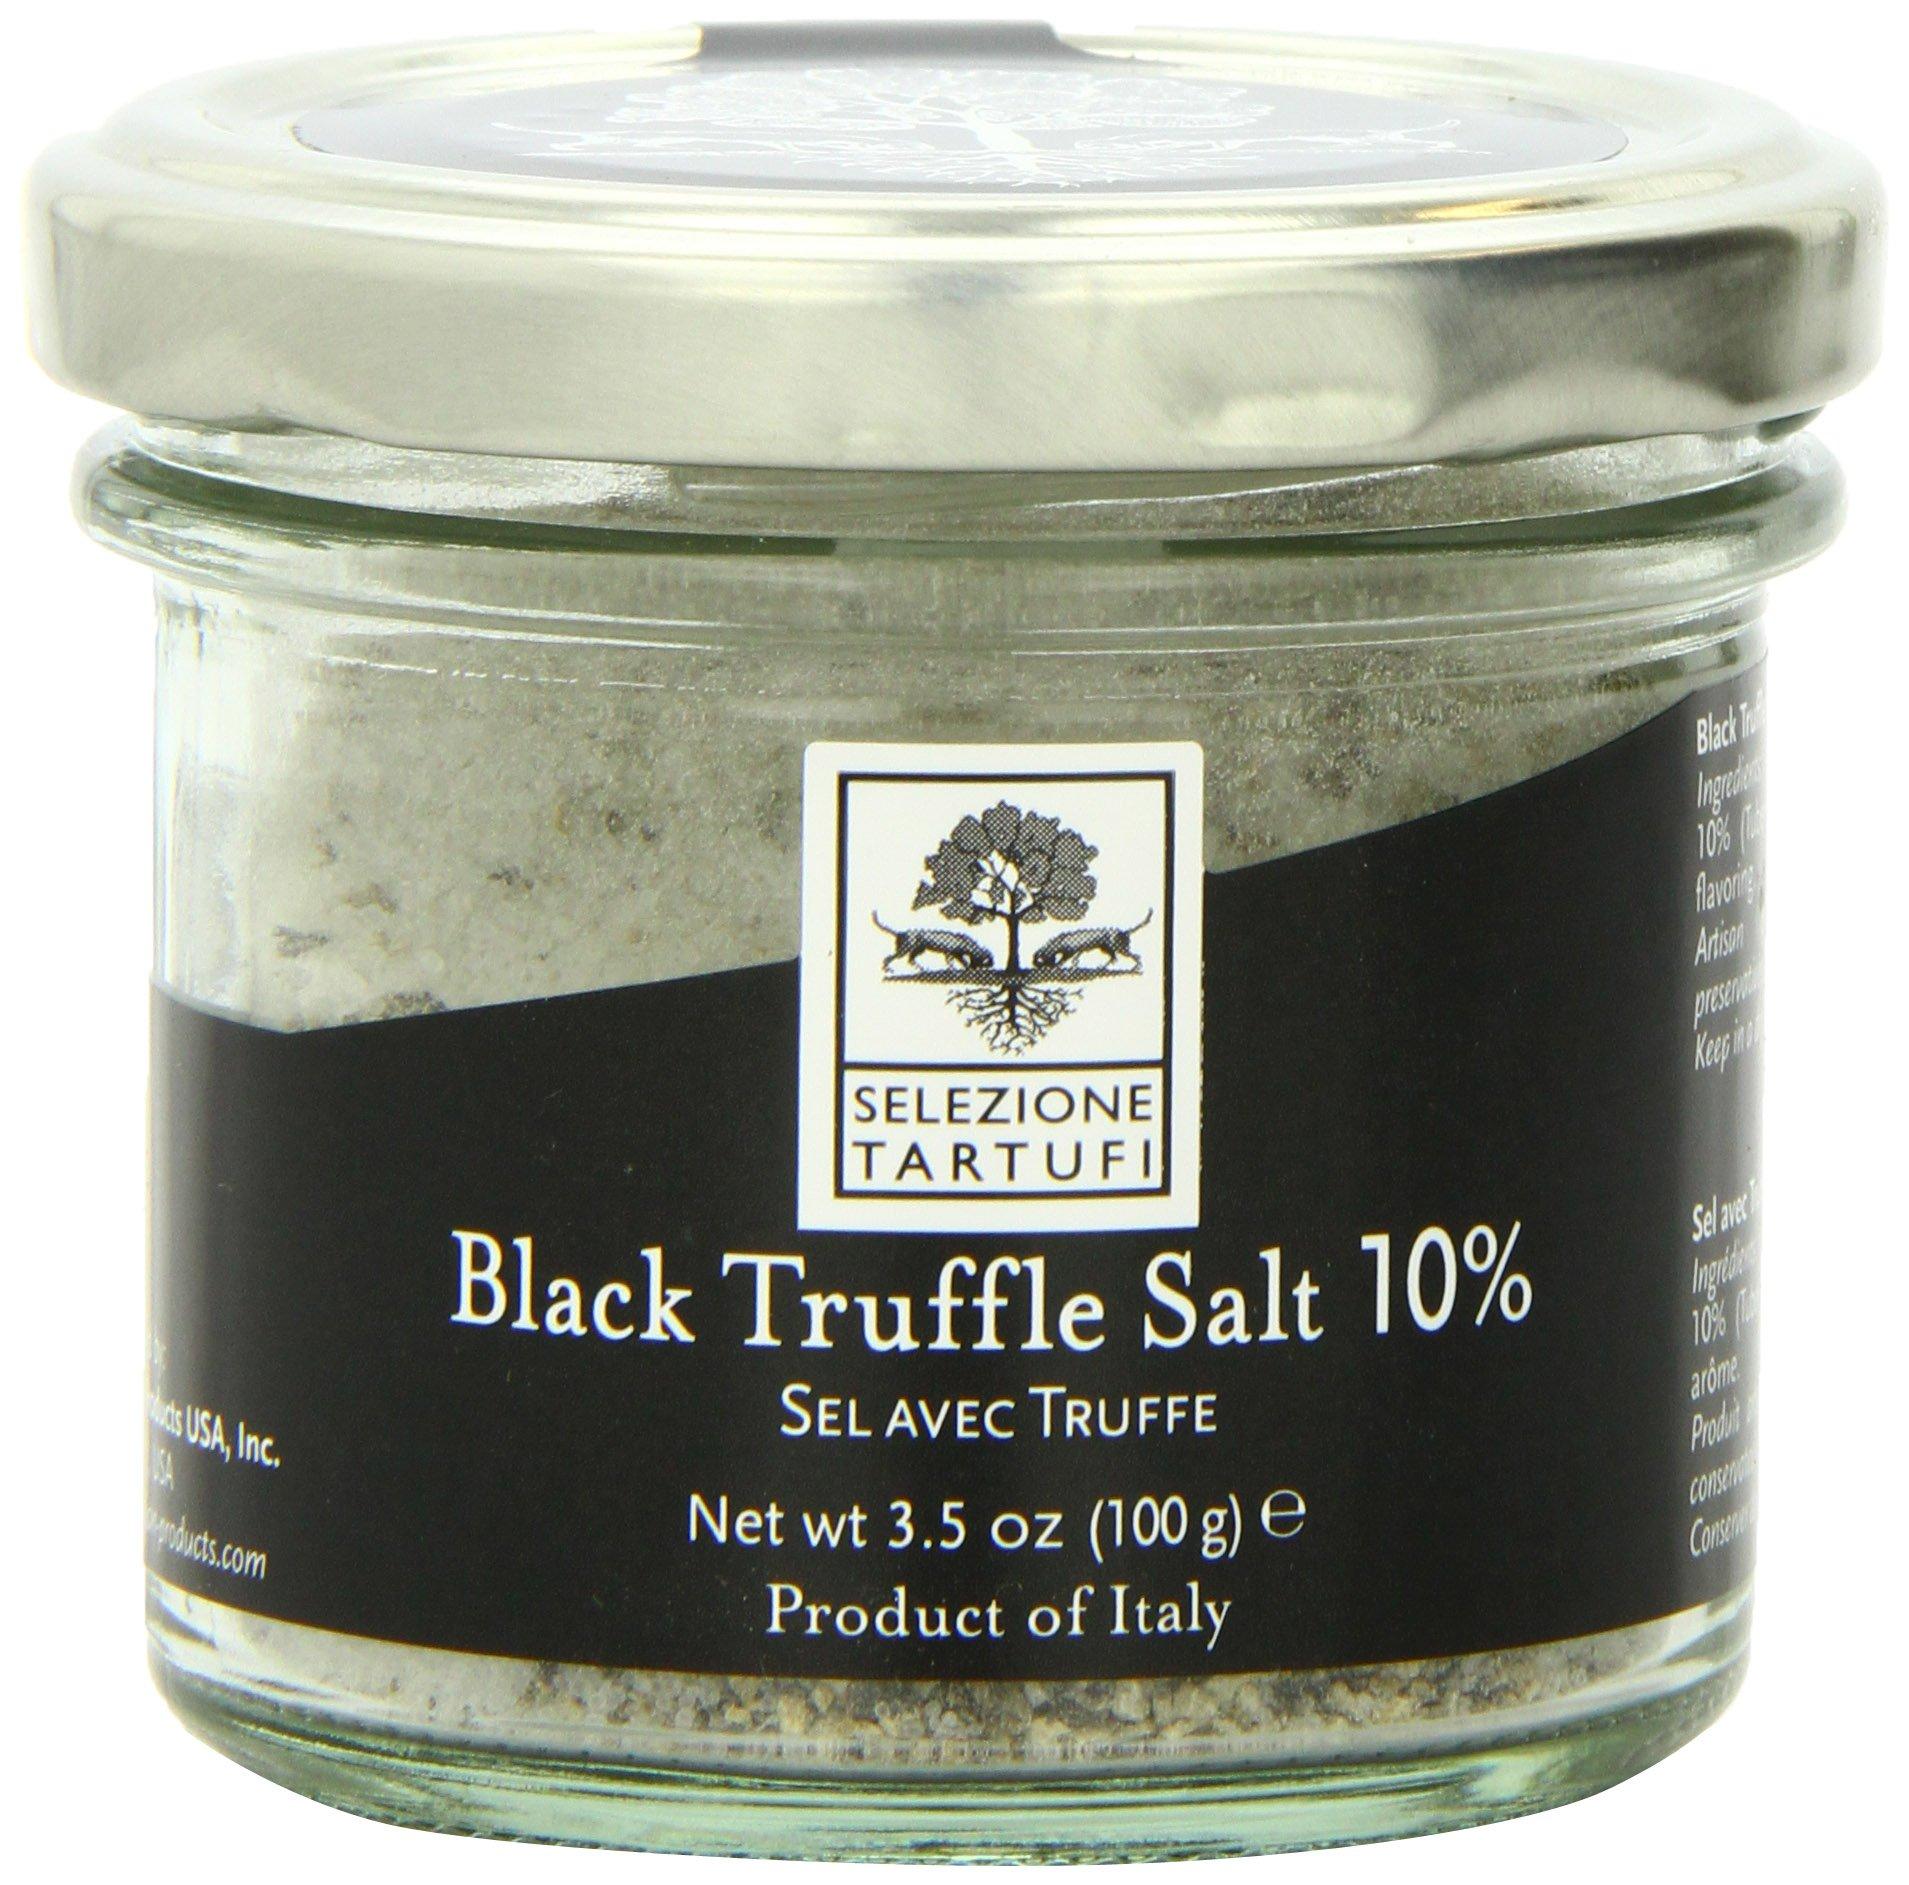 Selezione Tartufi Black Truffle Salt 10%, 3.5 Ounce Unit by Selezione Tartufi